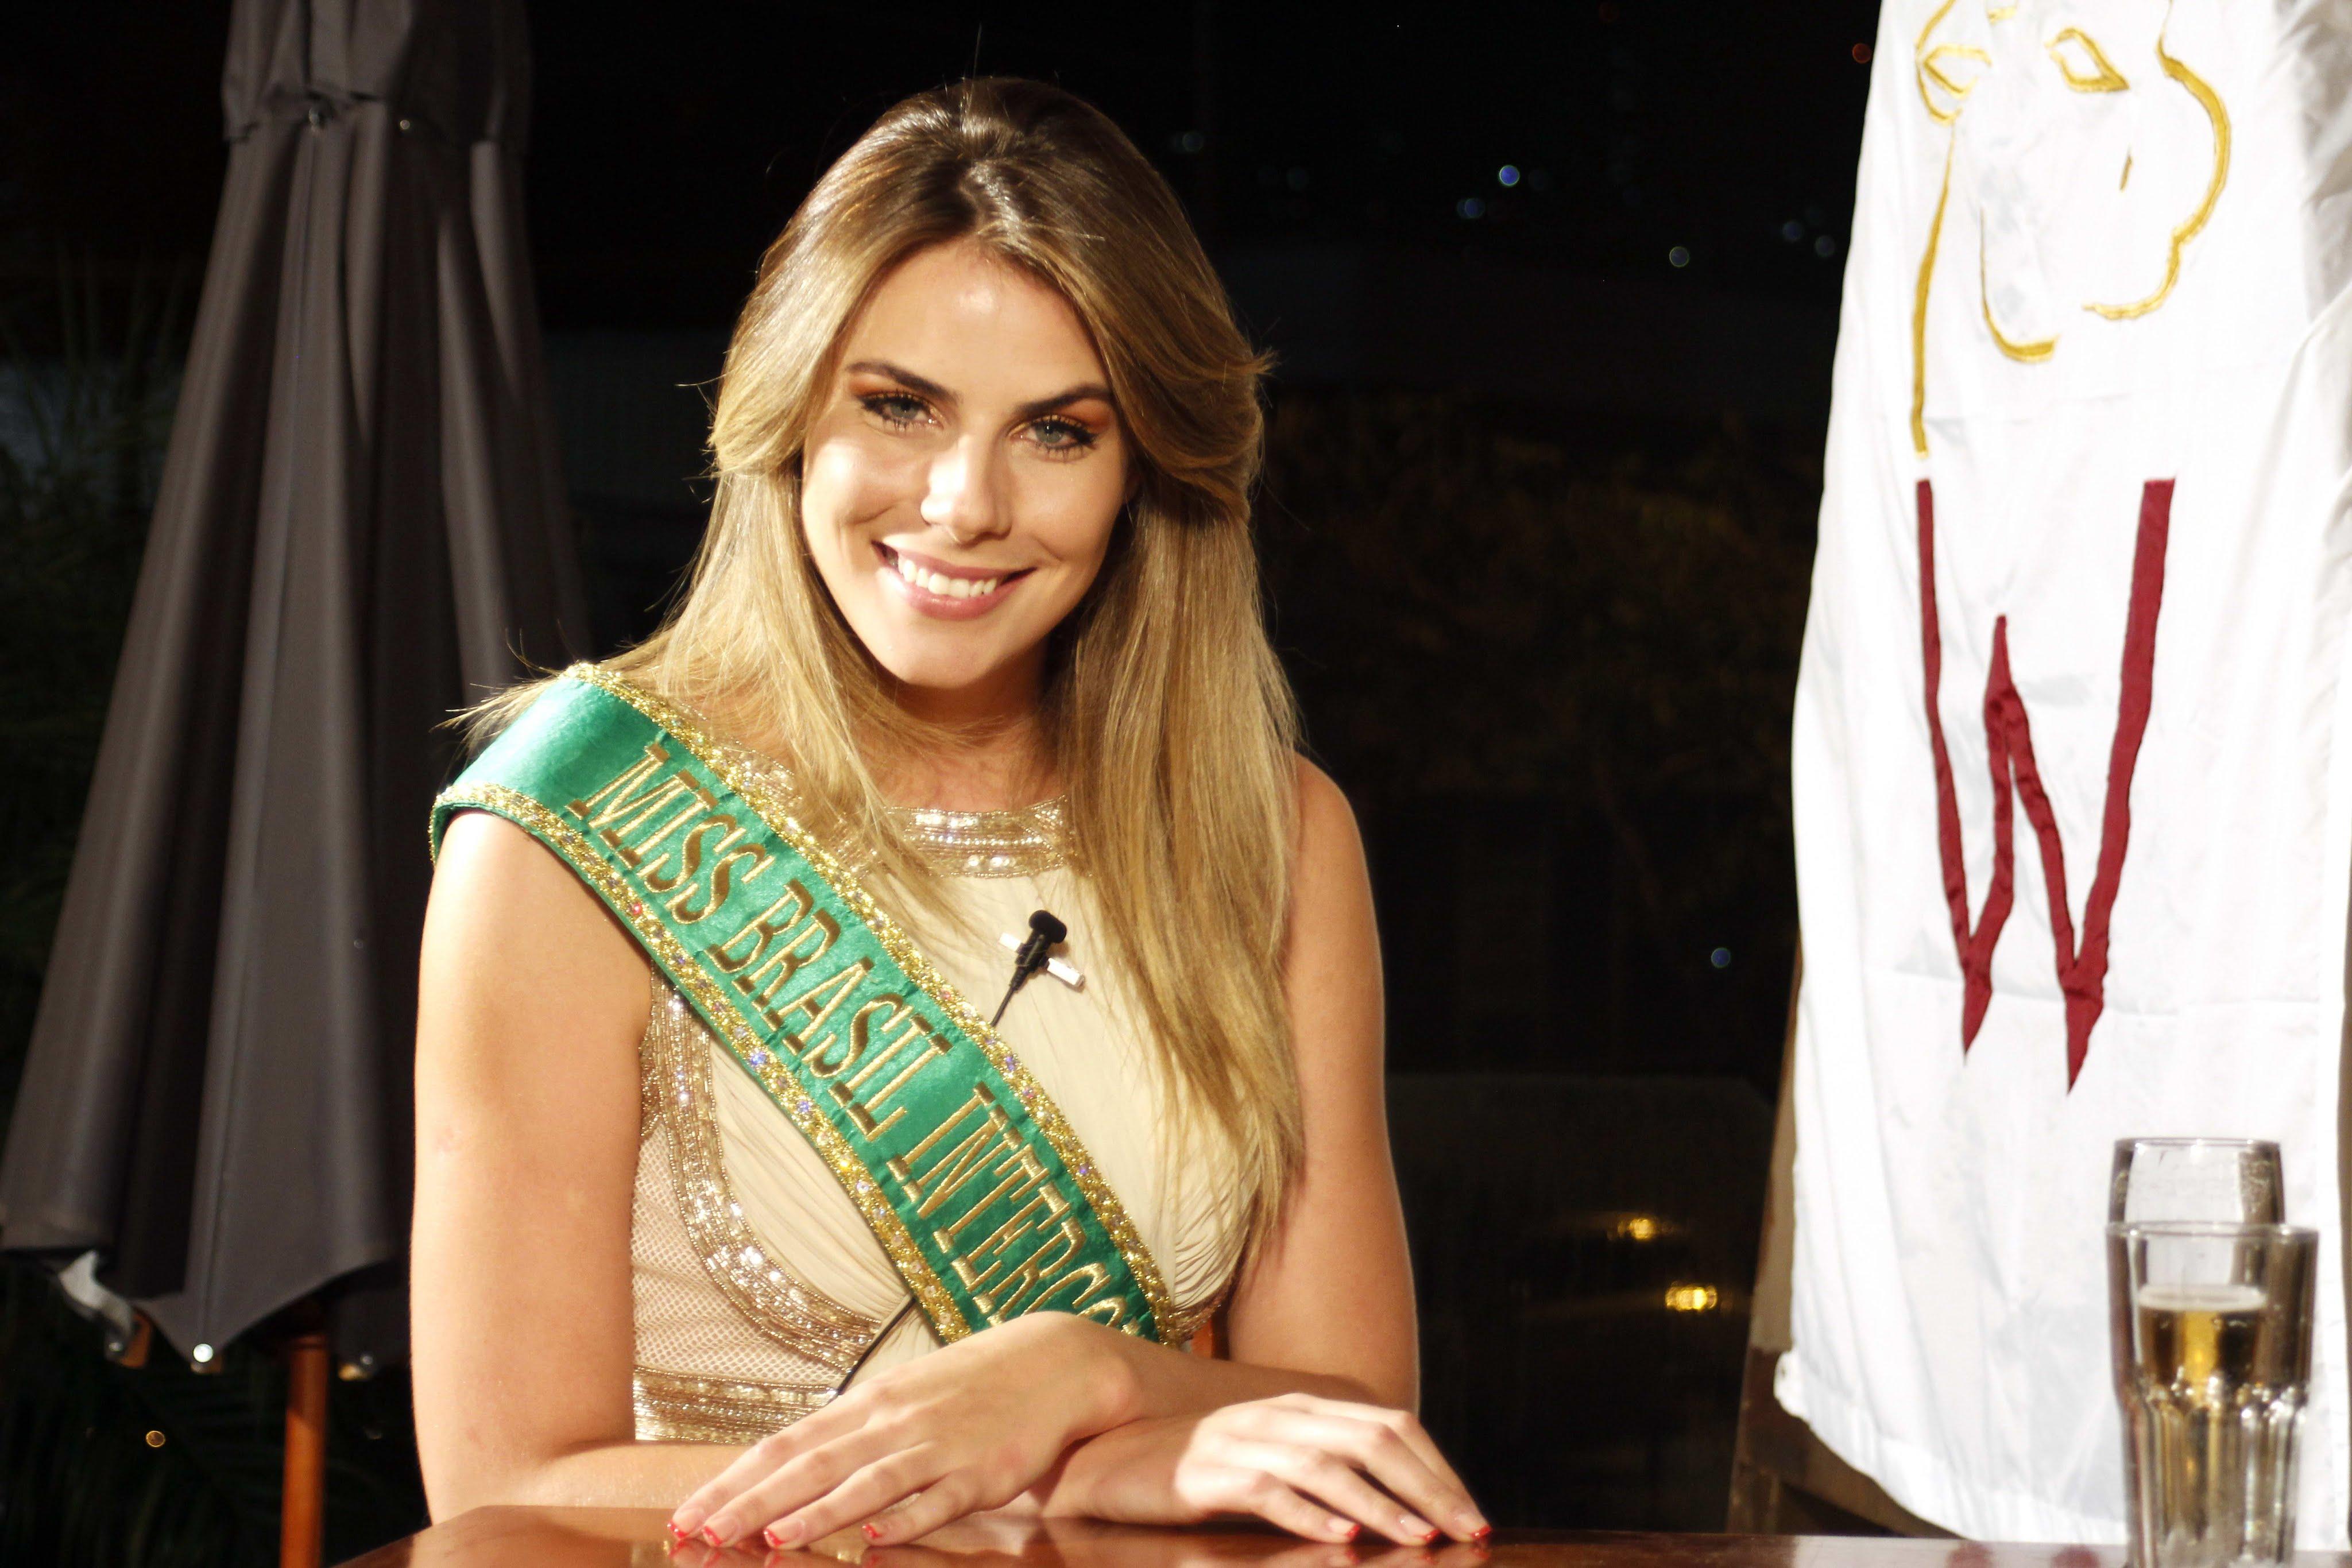 lilioze amaral, miss brasil intercontinental 2015. V5ndiswh